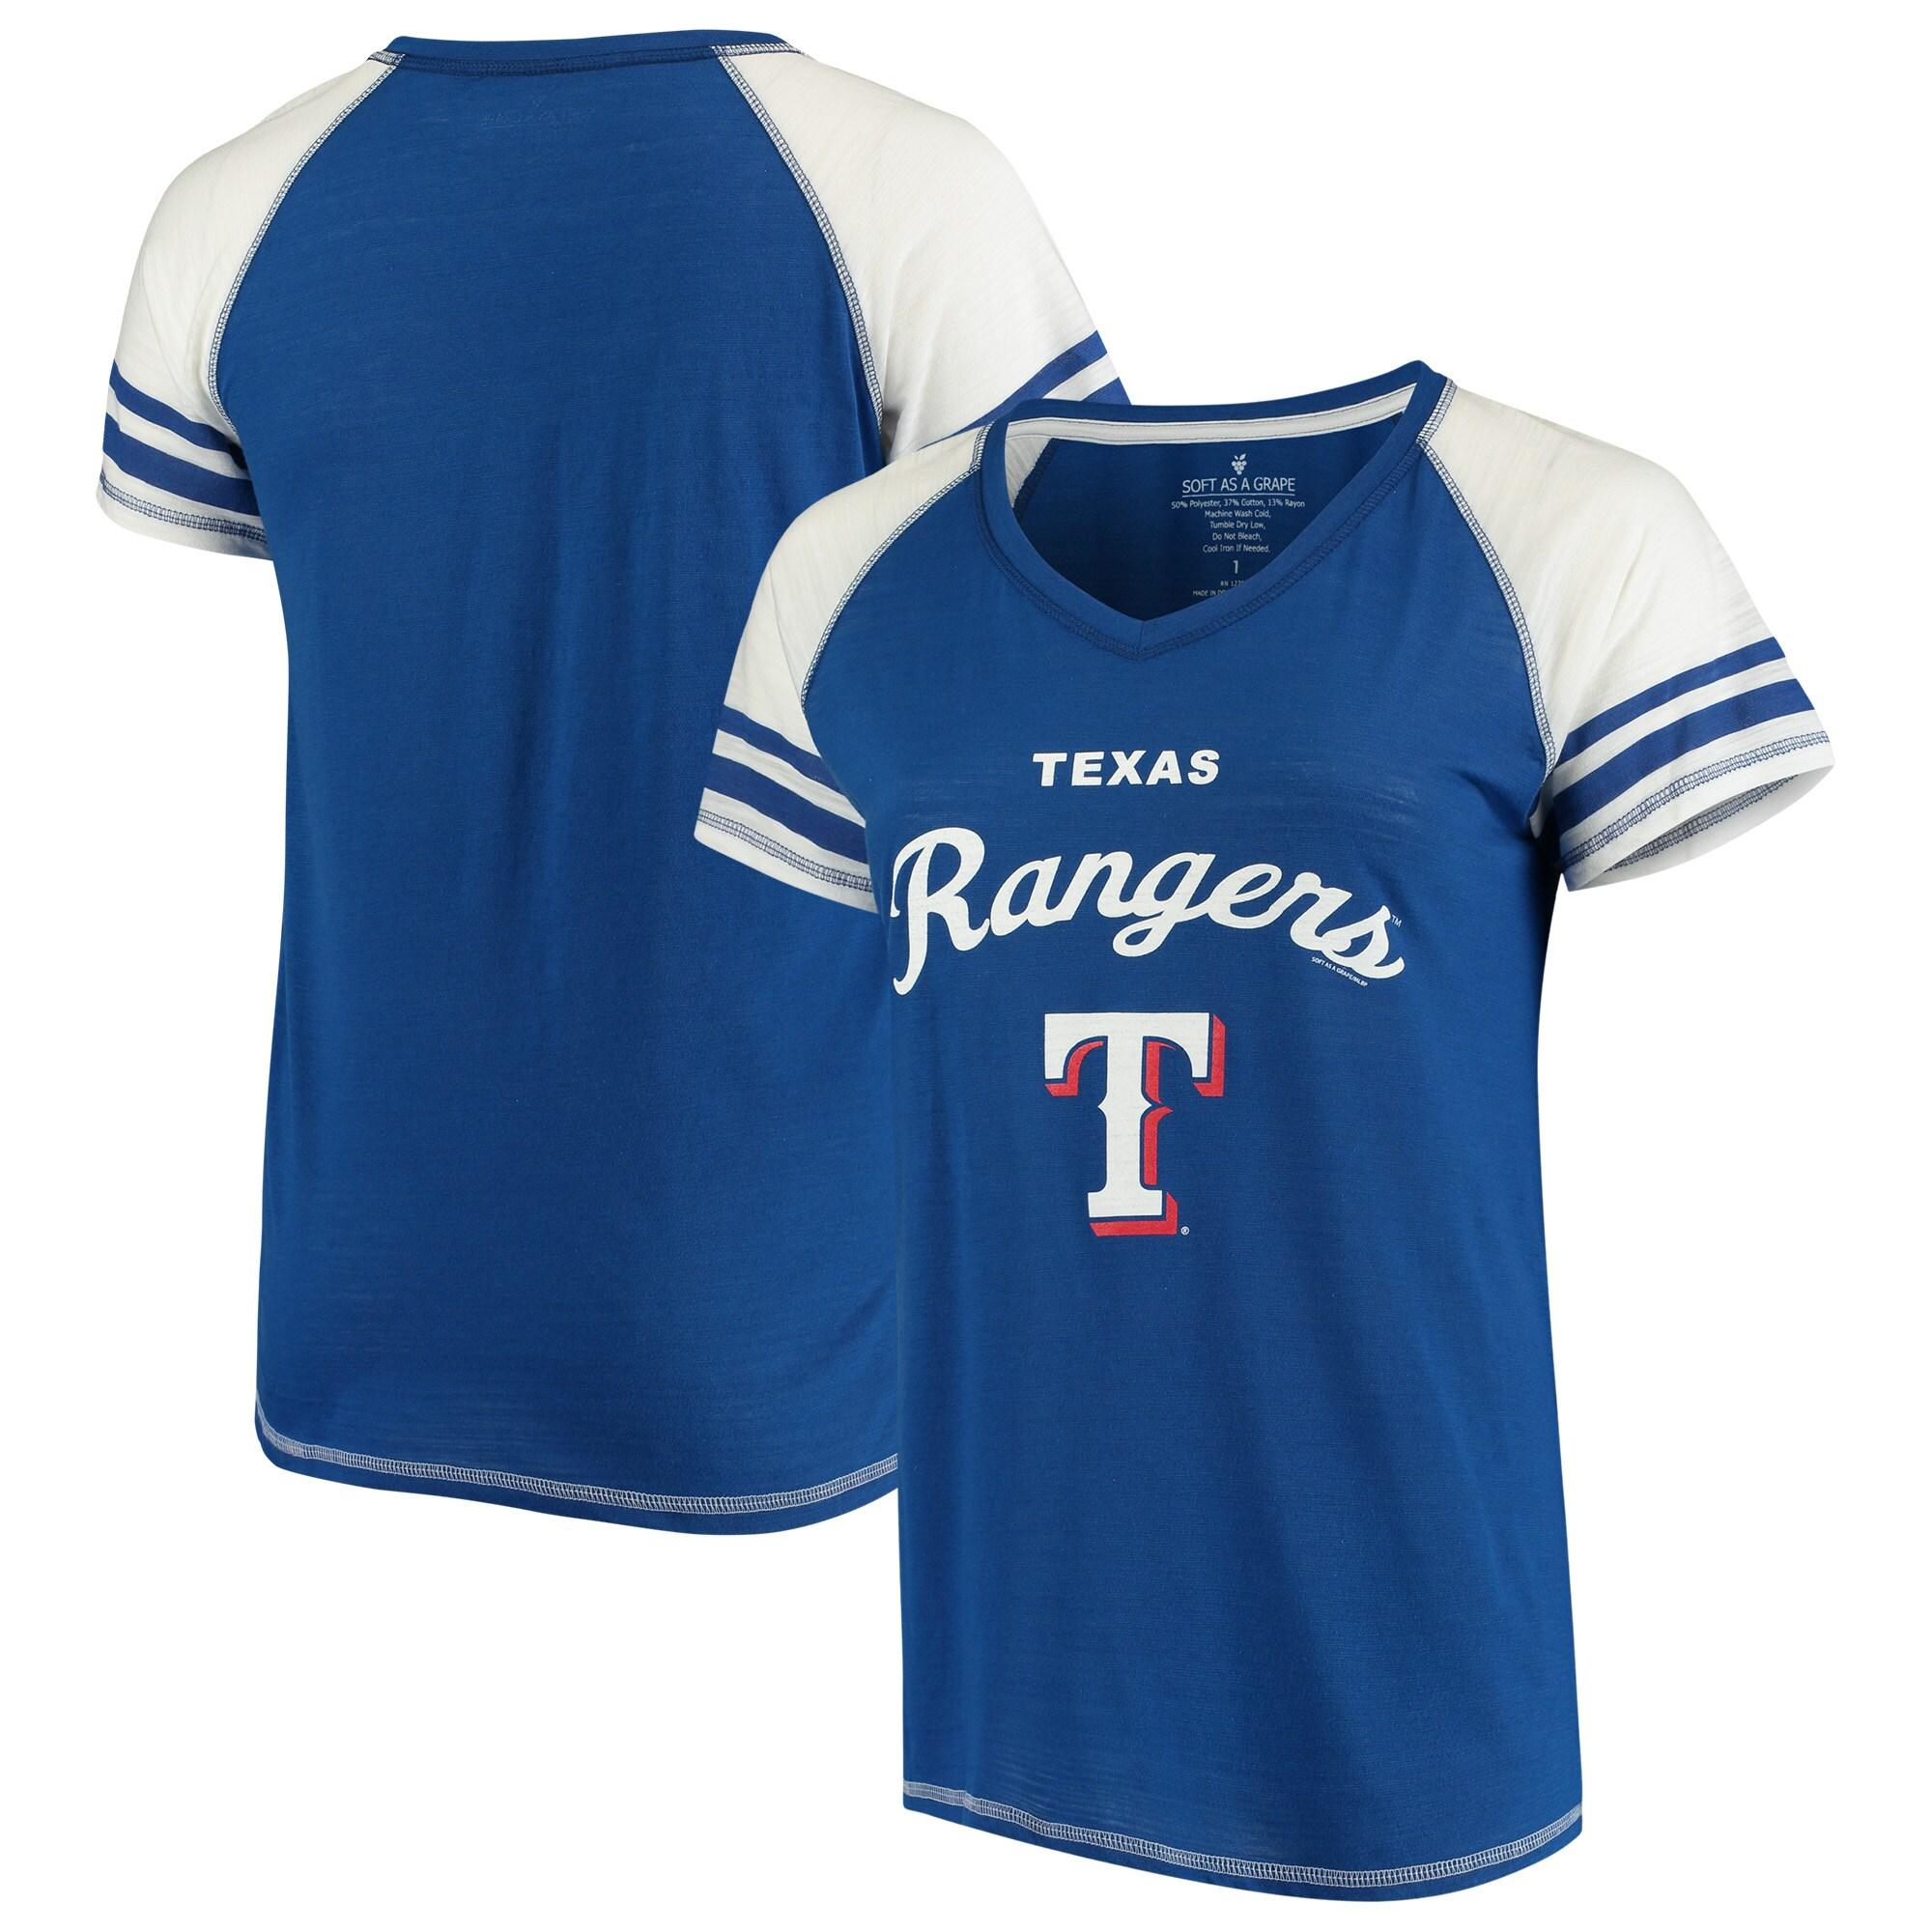 Texas Rangers Soft as a Grape Women's Curvy Three Out Color Blocked Raglan V-Neck T-Shirt - Royal